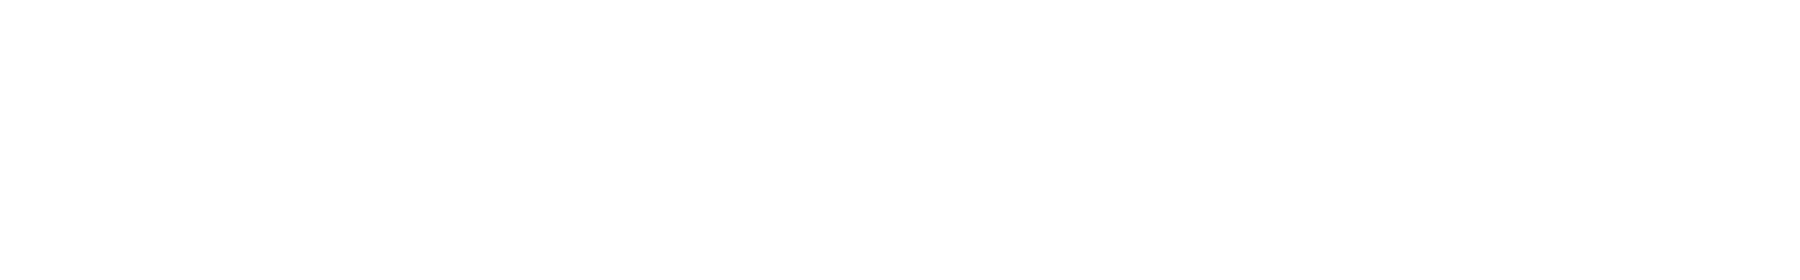 bluezone bc0210 percussion 016